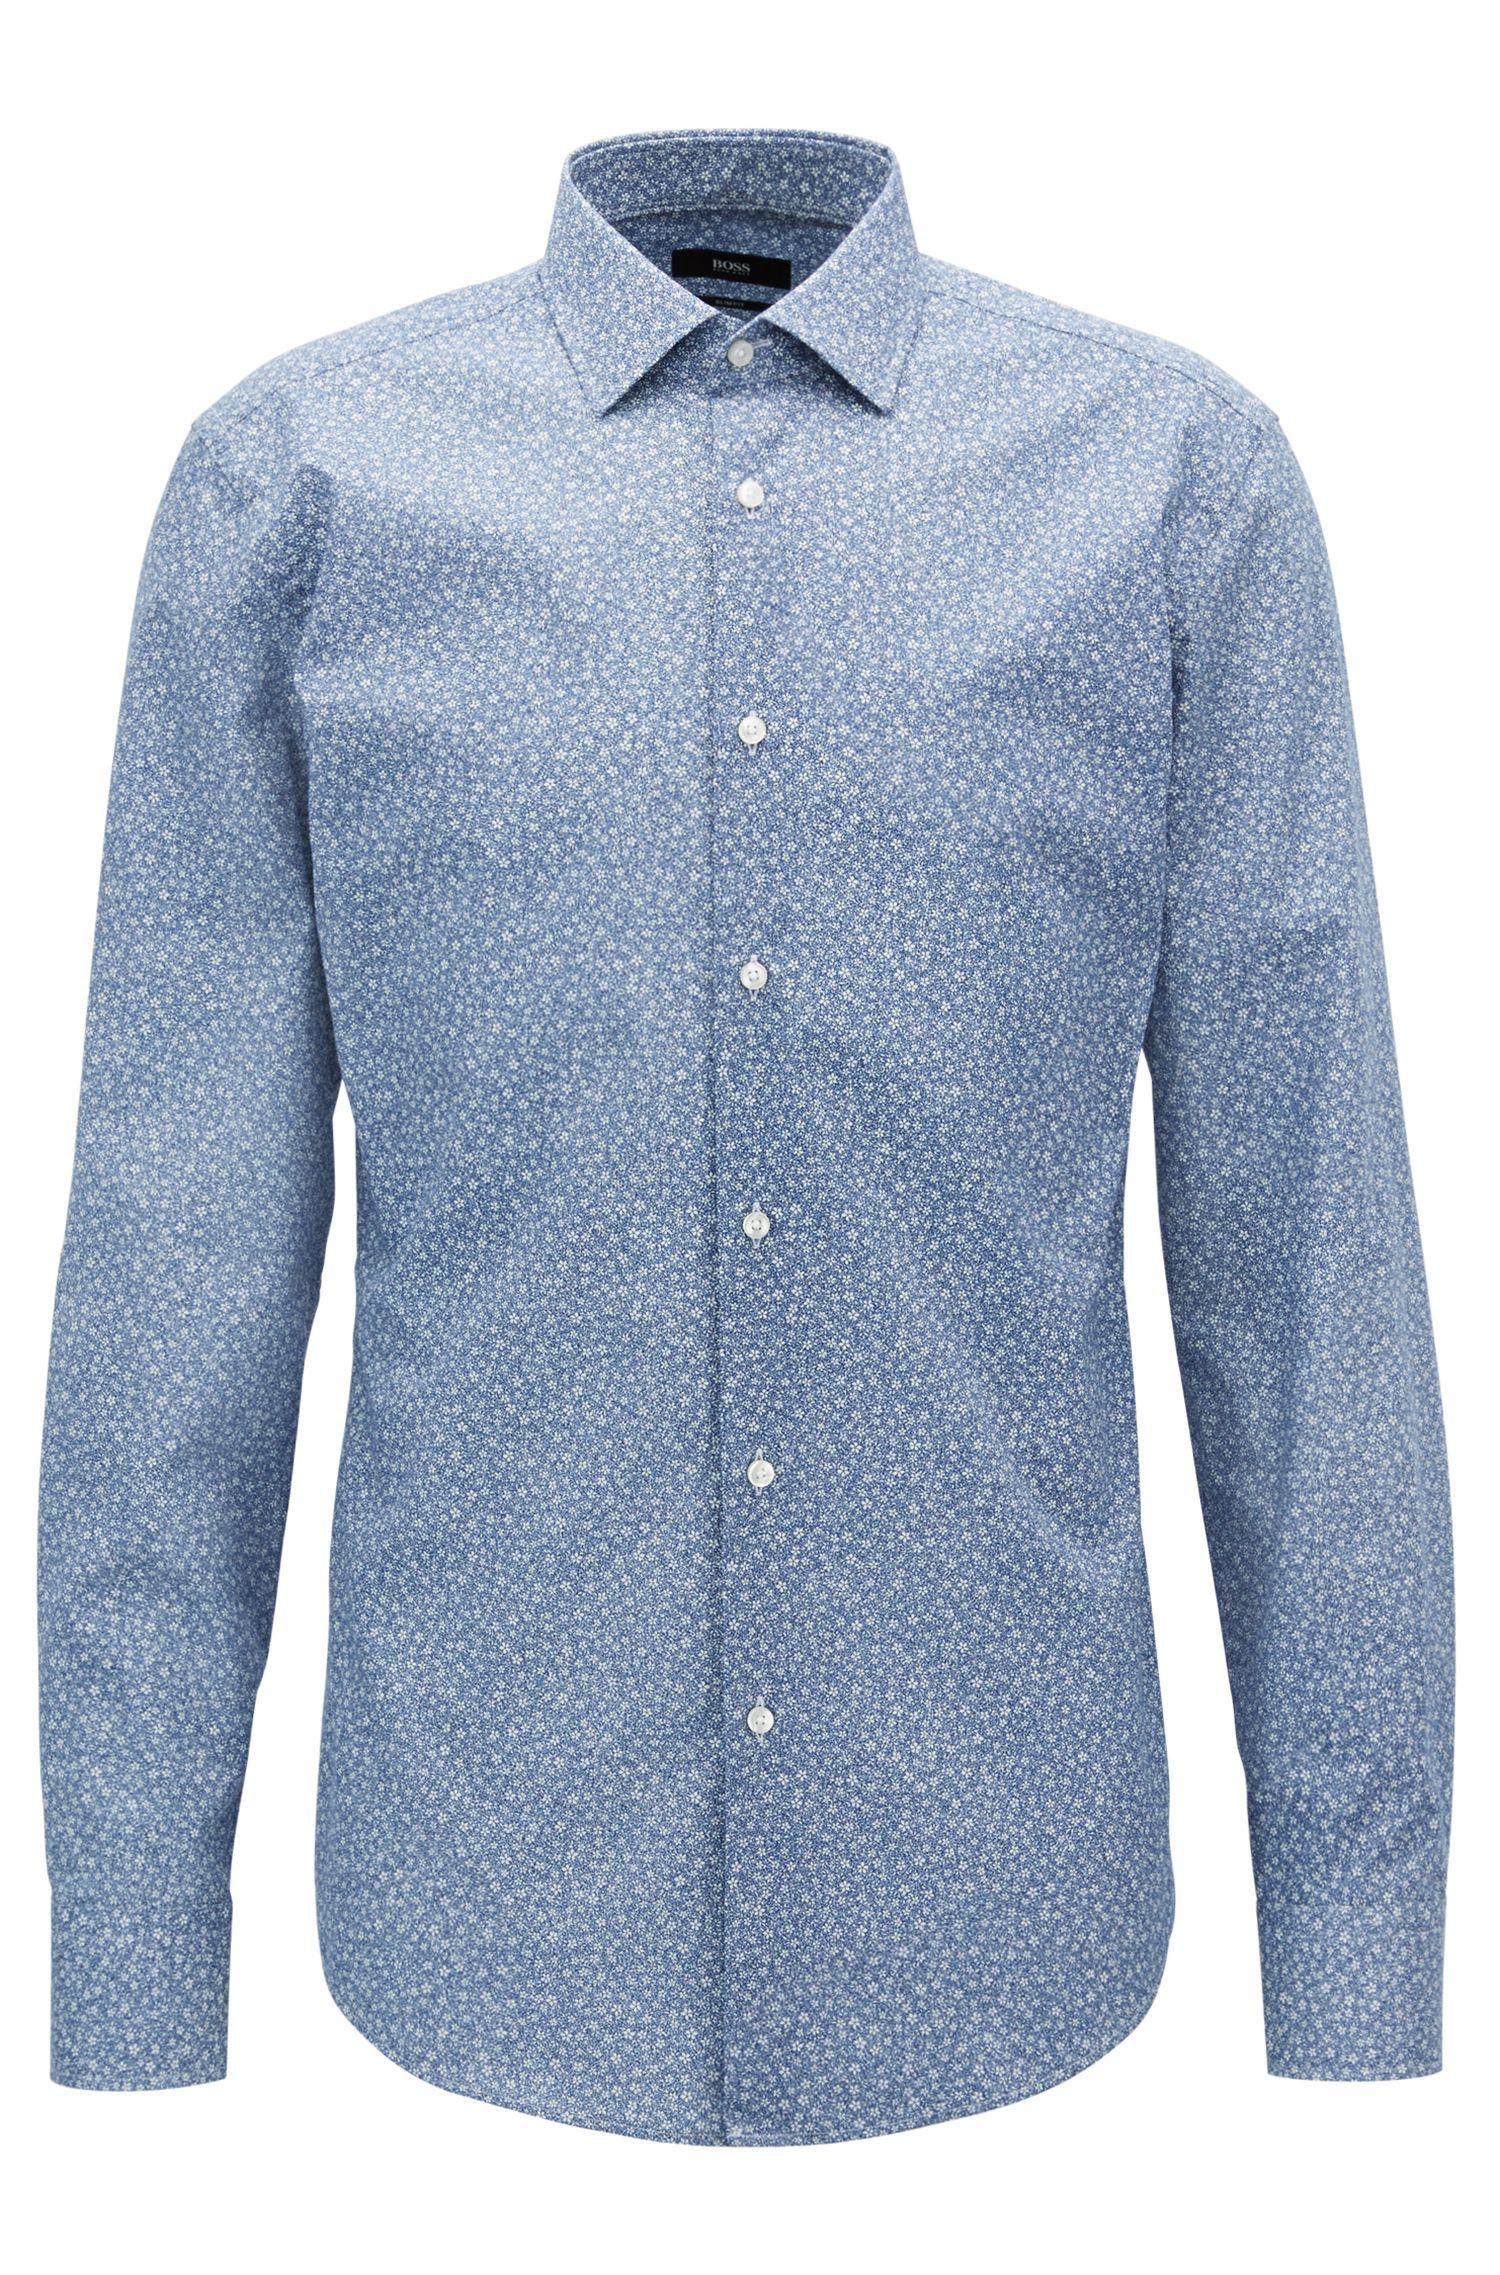 Floral-Print Cotton Dress Shirt, Slim Fit | Jenno